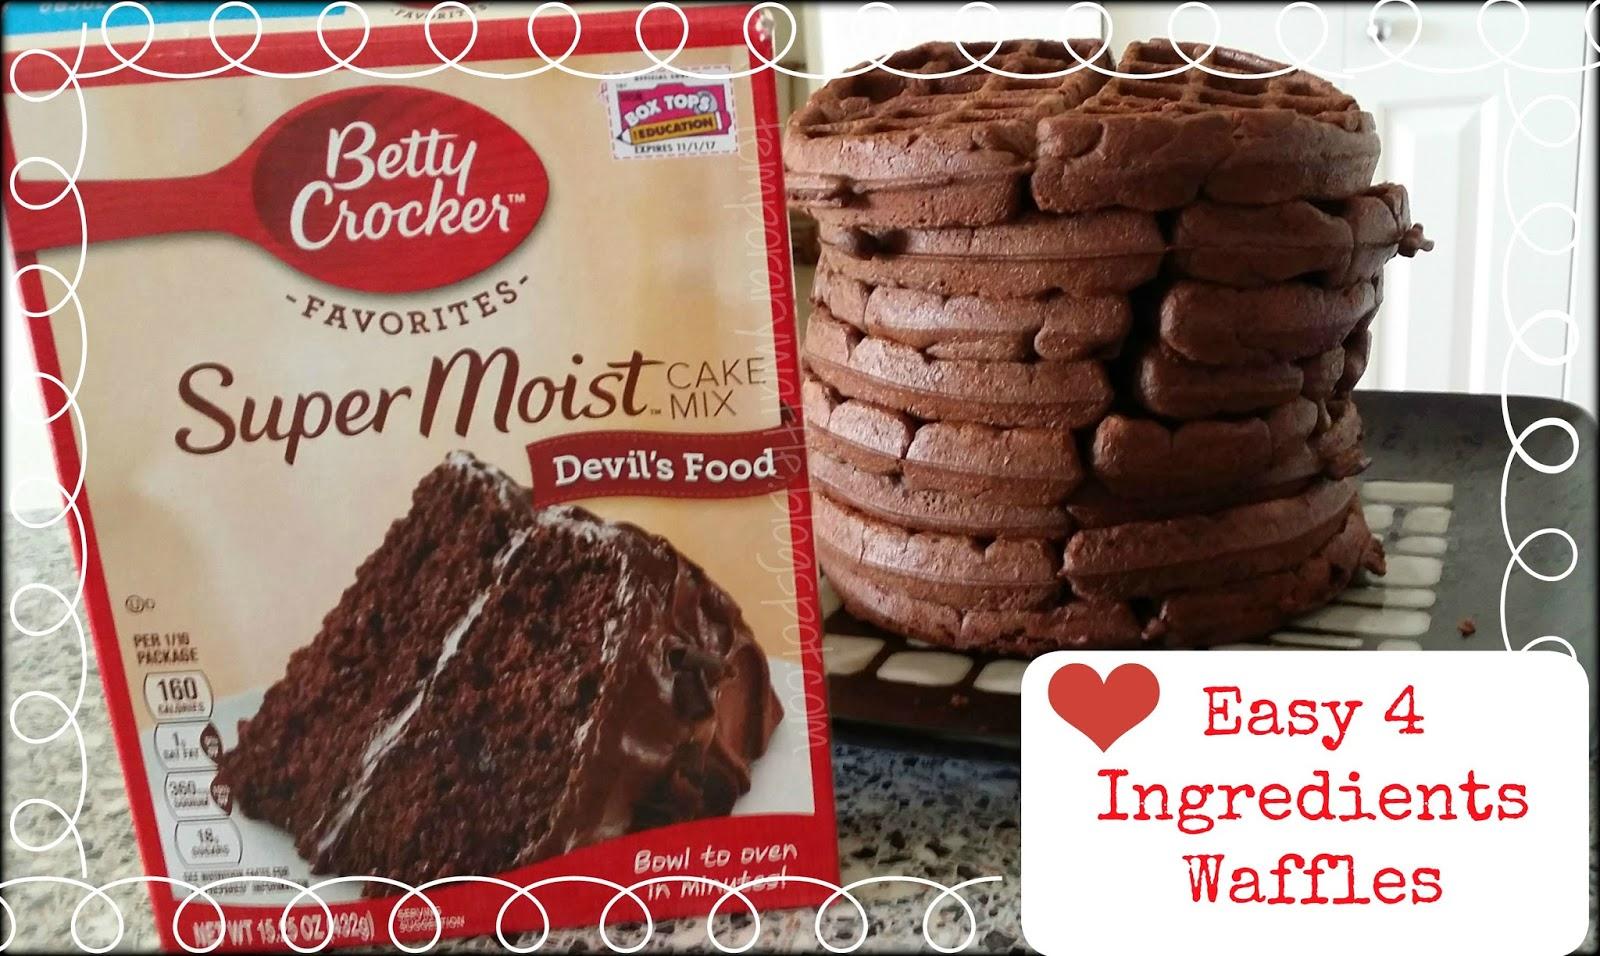 Betty Crocker Super Moist Chocolate Fudge Cake Mix Instructions